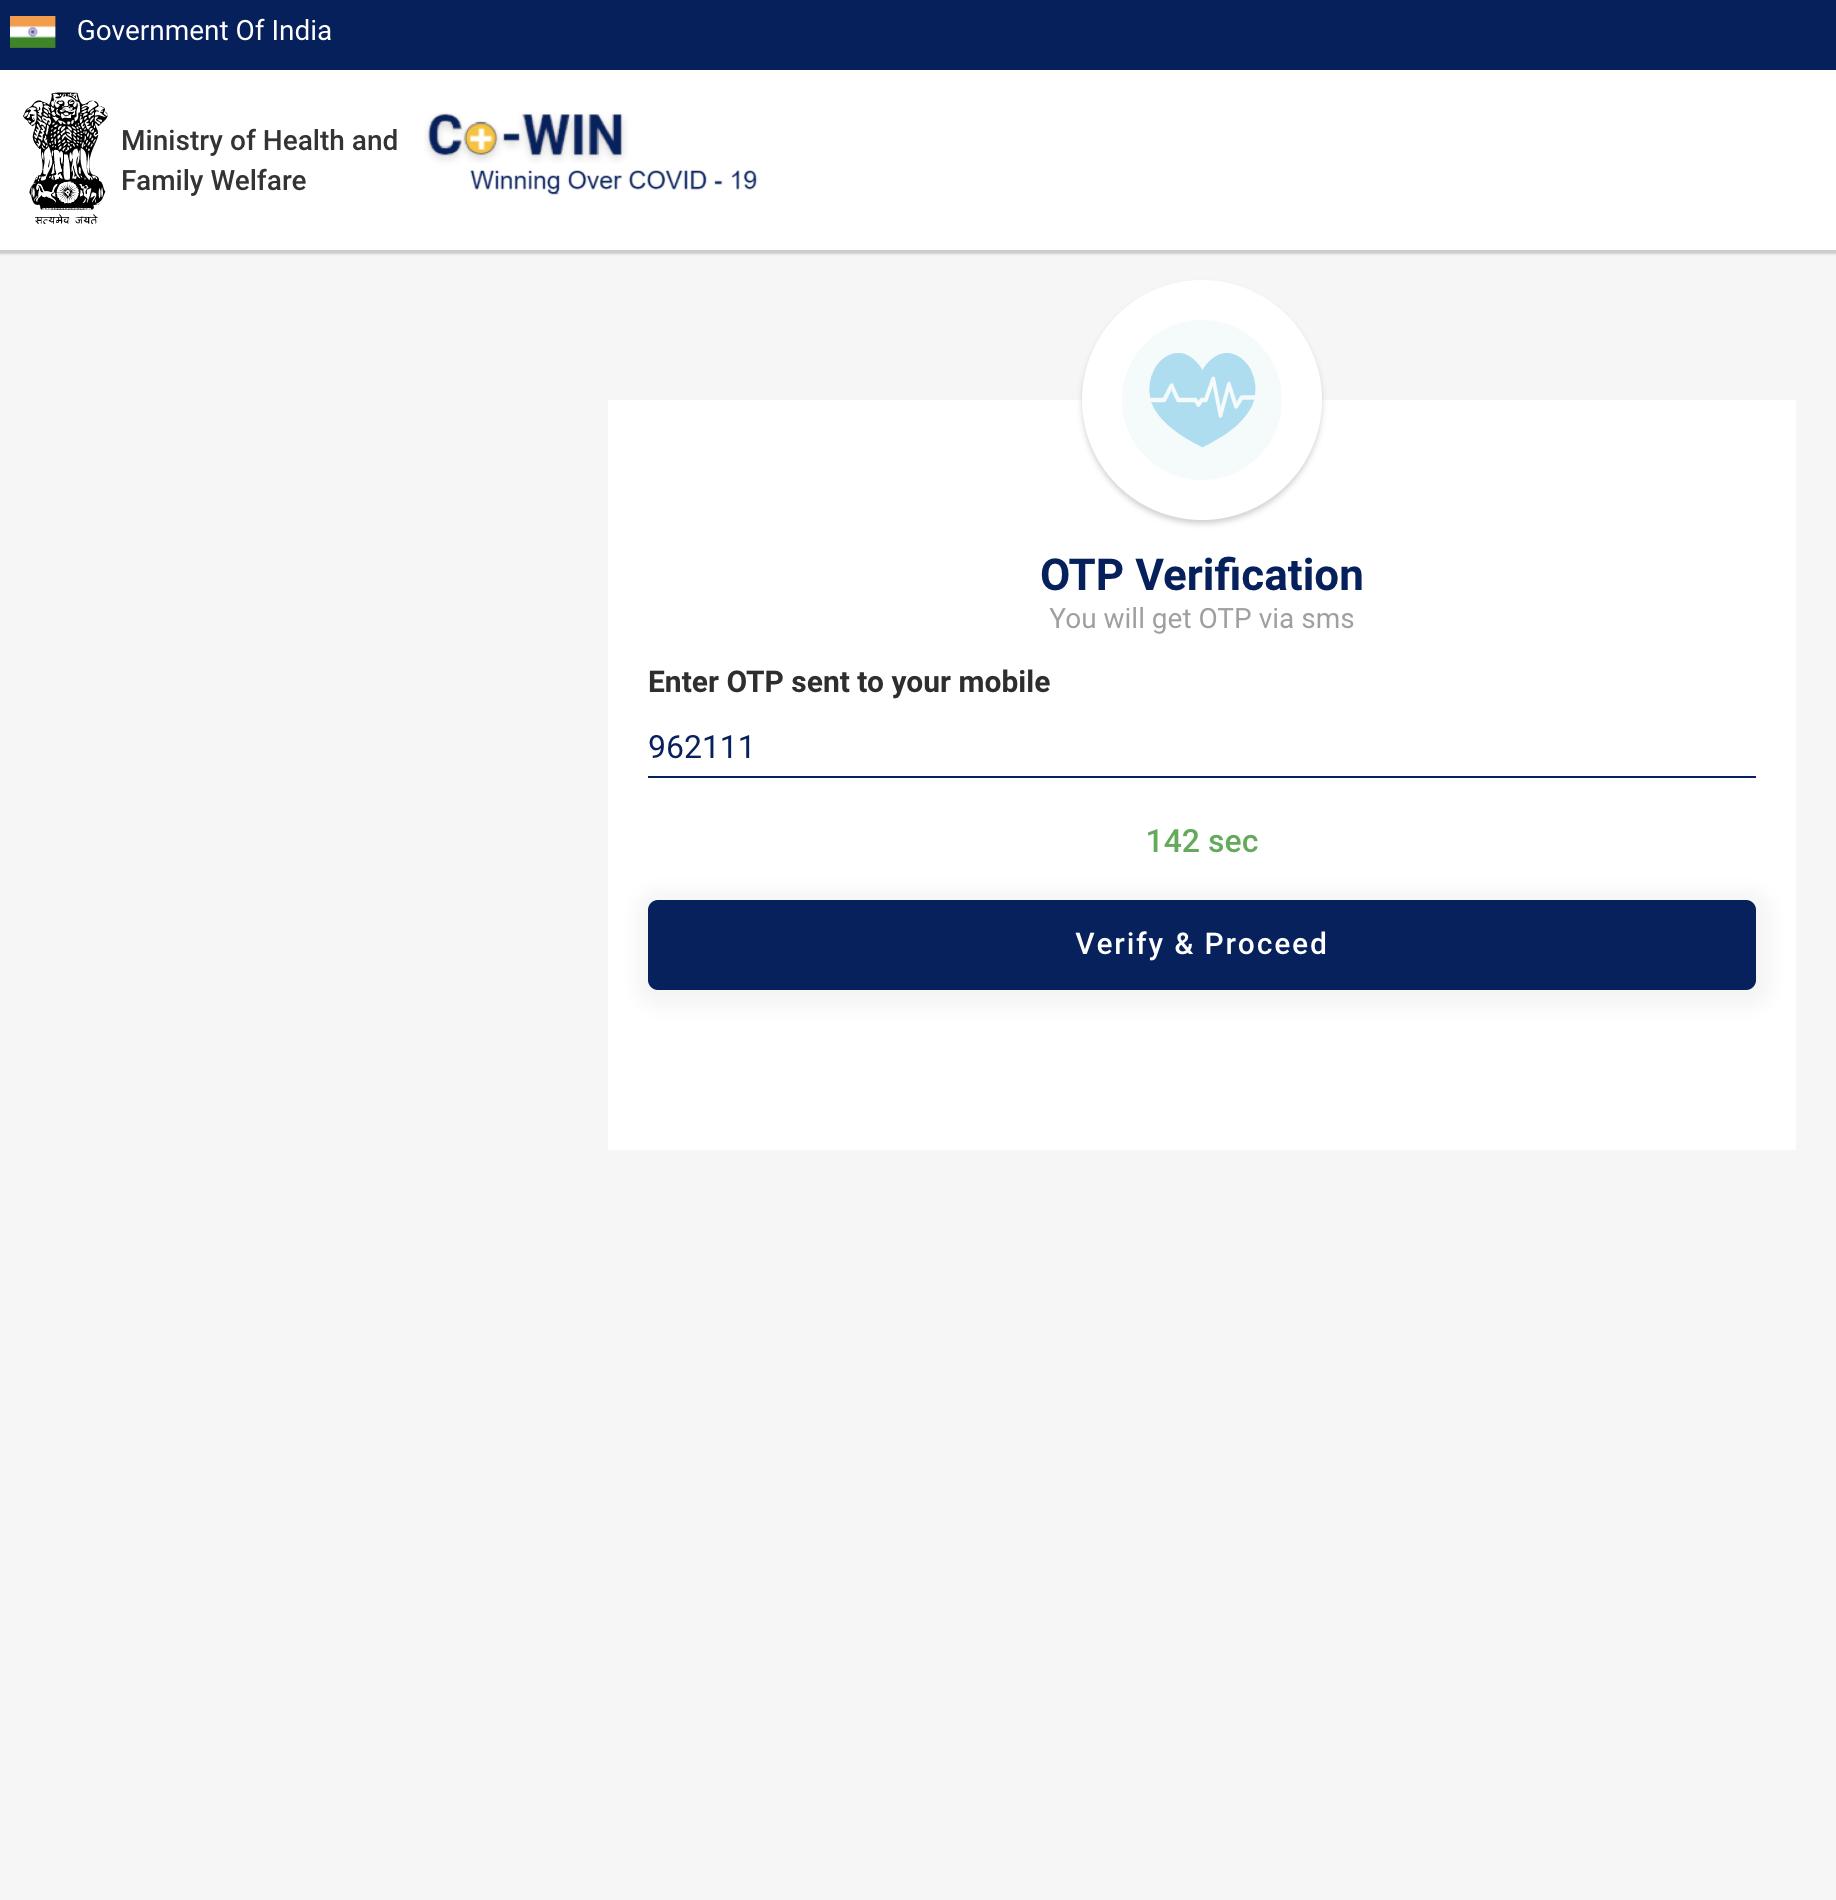 Cowin Covid India Vaccination Registration